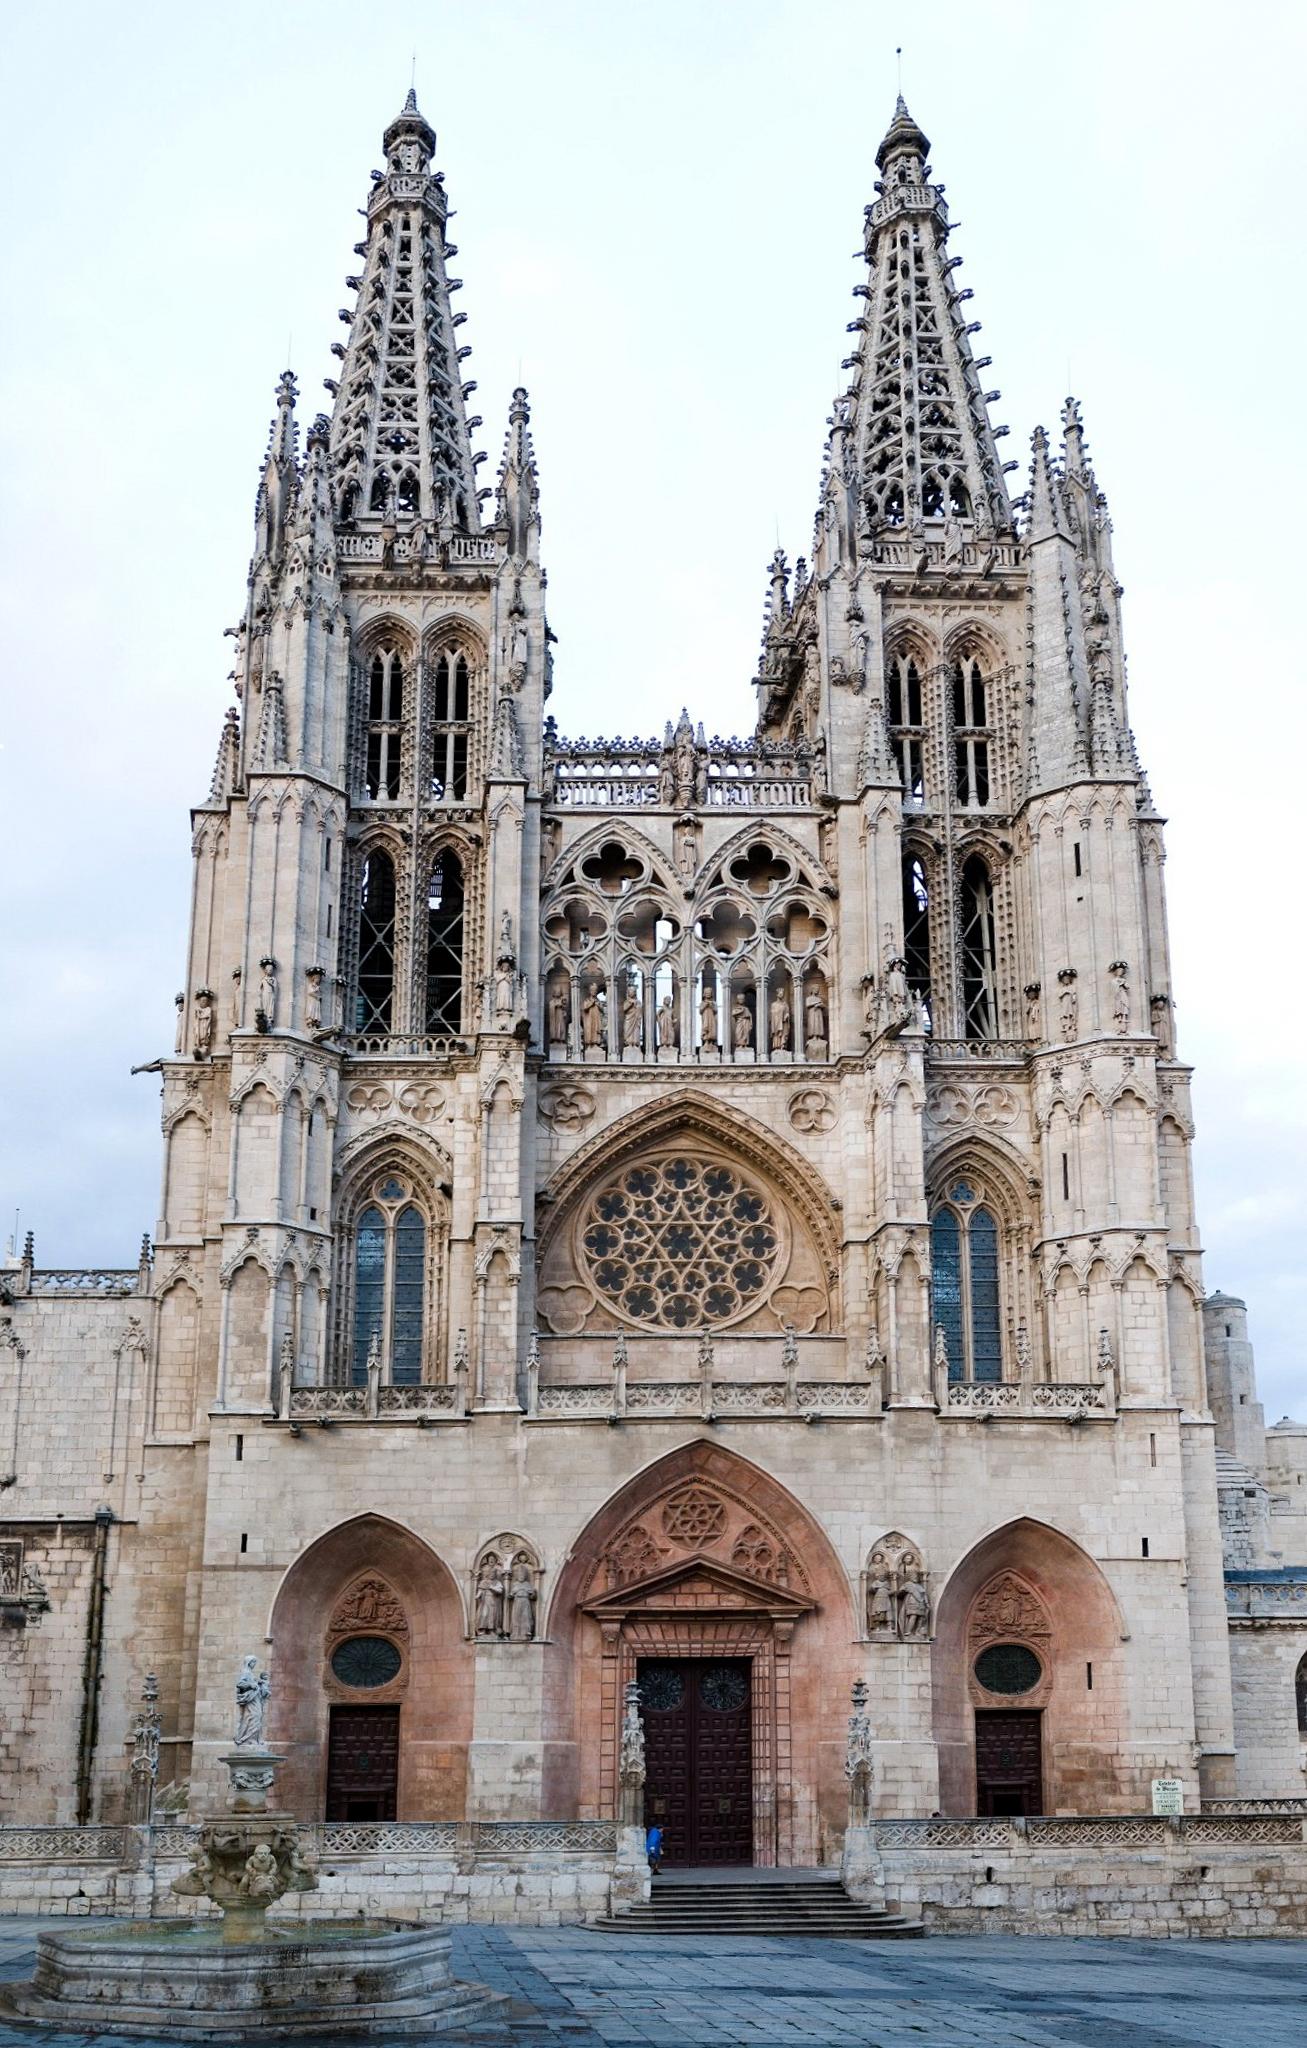 File:Catedral de Burgos.jpg - Wikipedia, the free encyclopedia